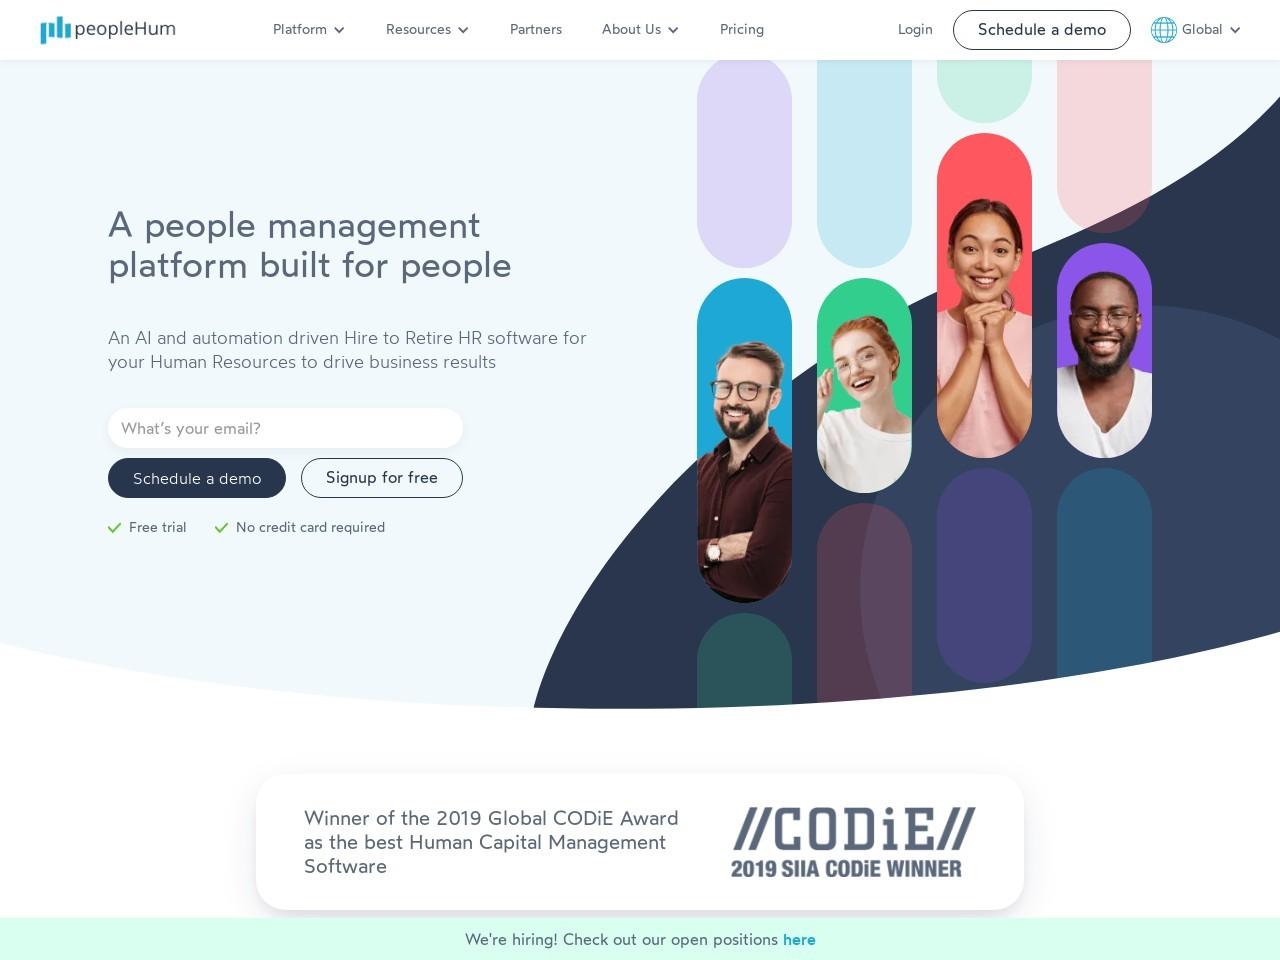 peopleHum an end-to-end HR software platform